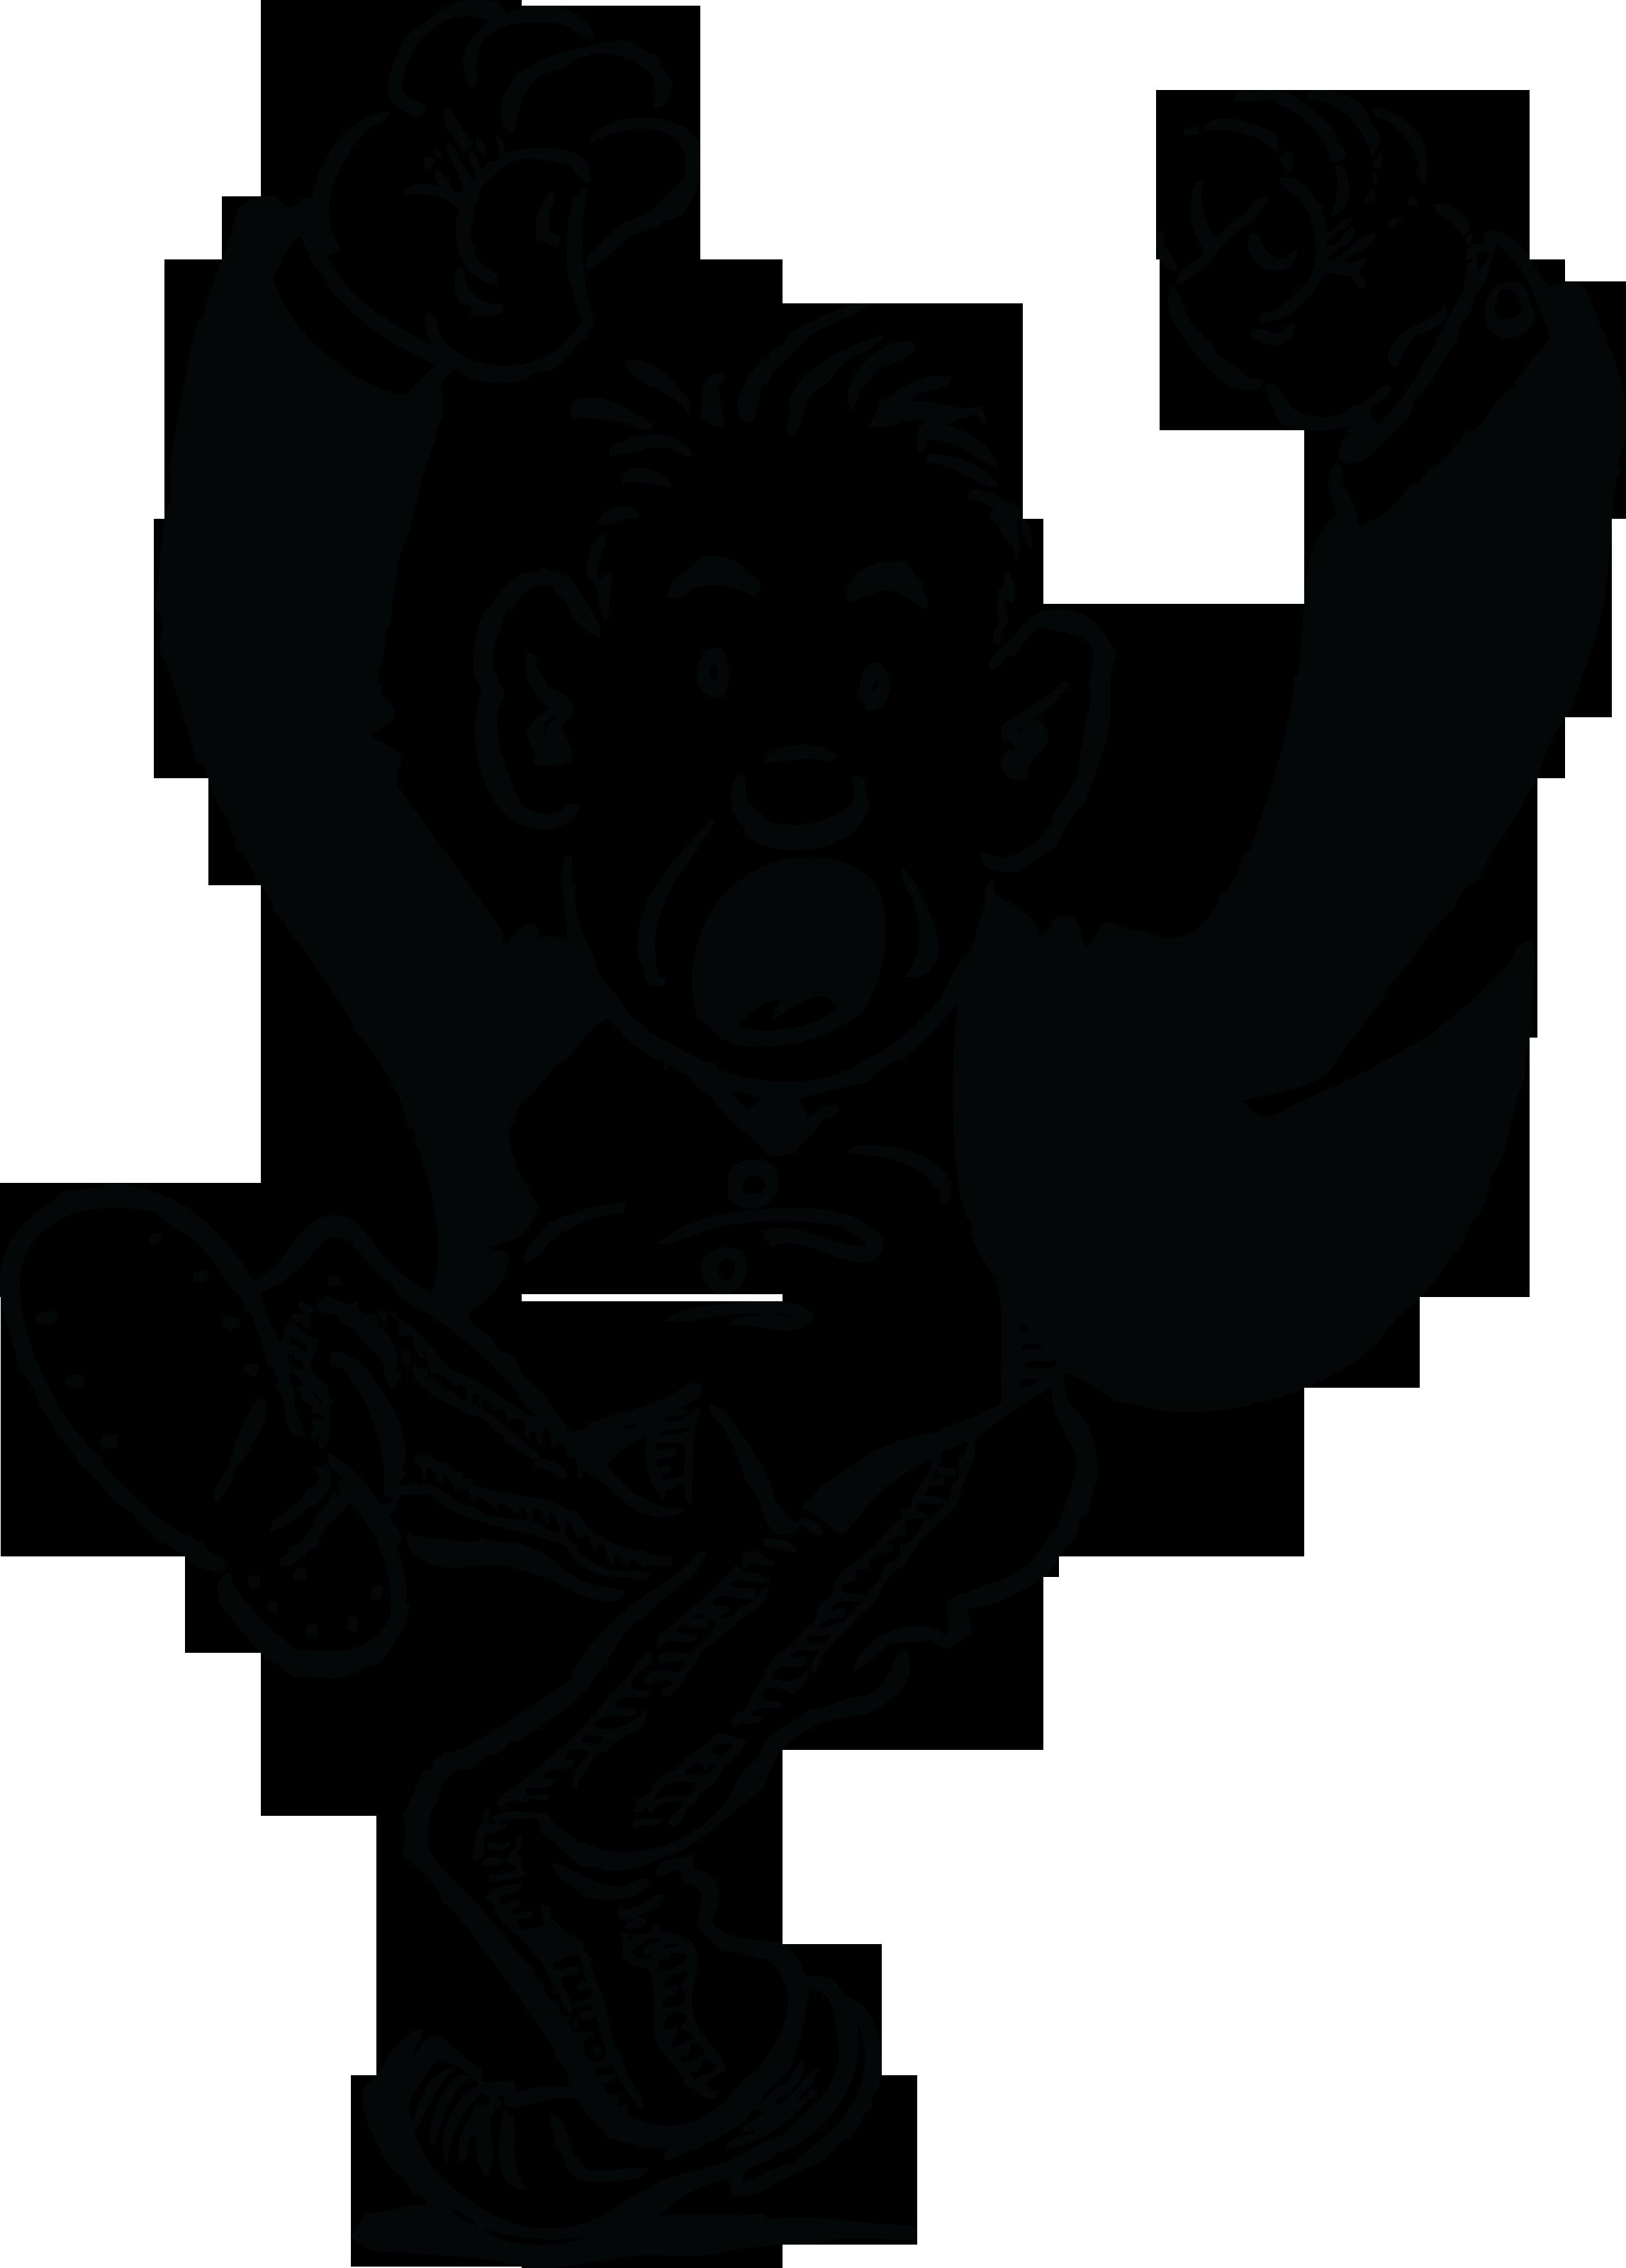 angry guy throwing temper tantrum free retro clipart illustration rh free clipartof com free retro clipart download free retro clipart images